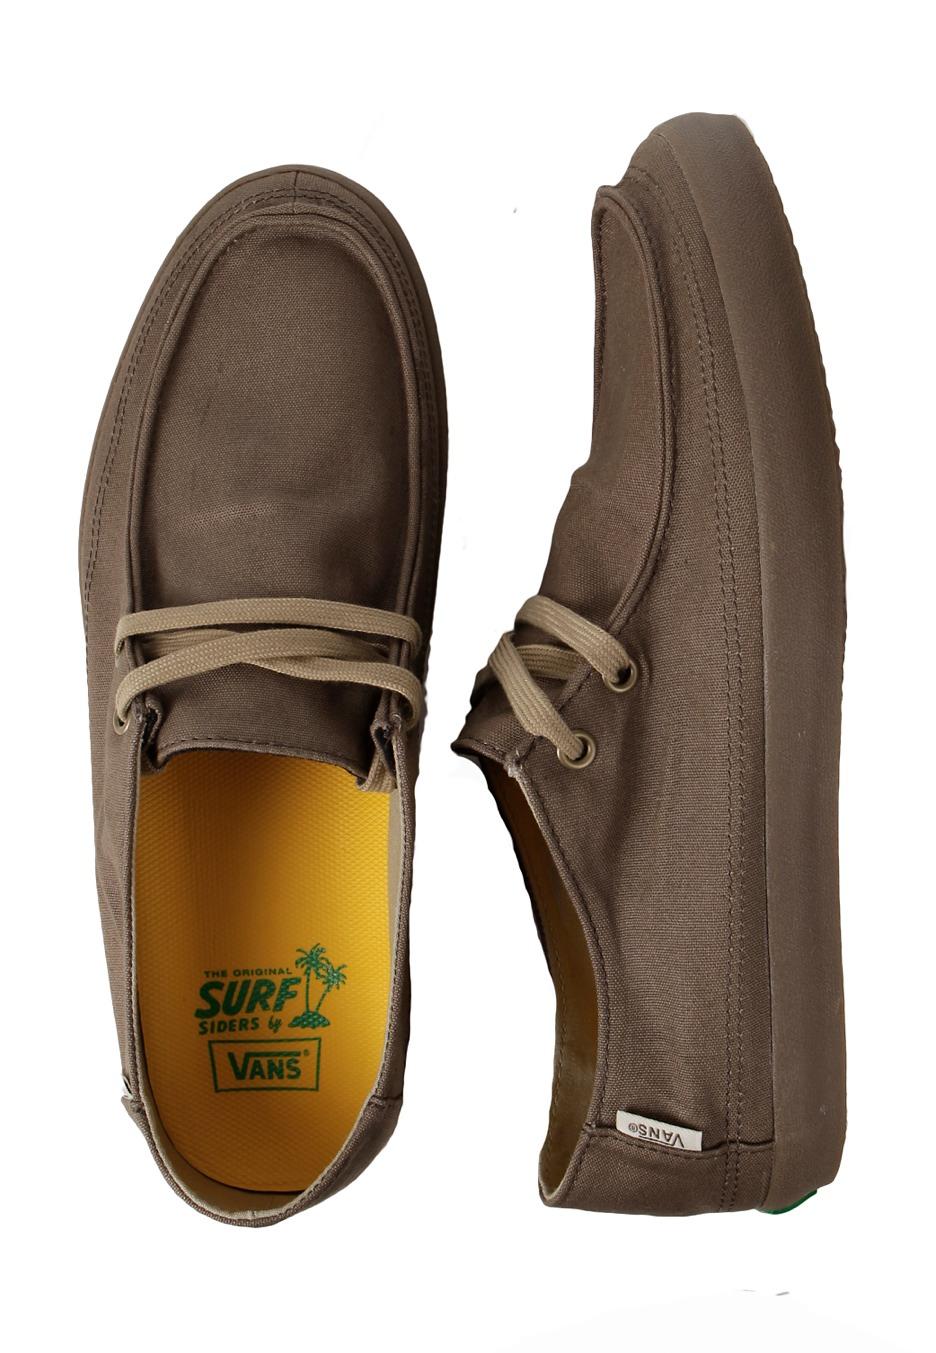 166da25df4 Vans - Rata Vulc Shitake Rasta - Shoes - Impericon.com UK